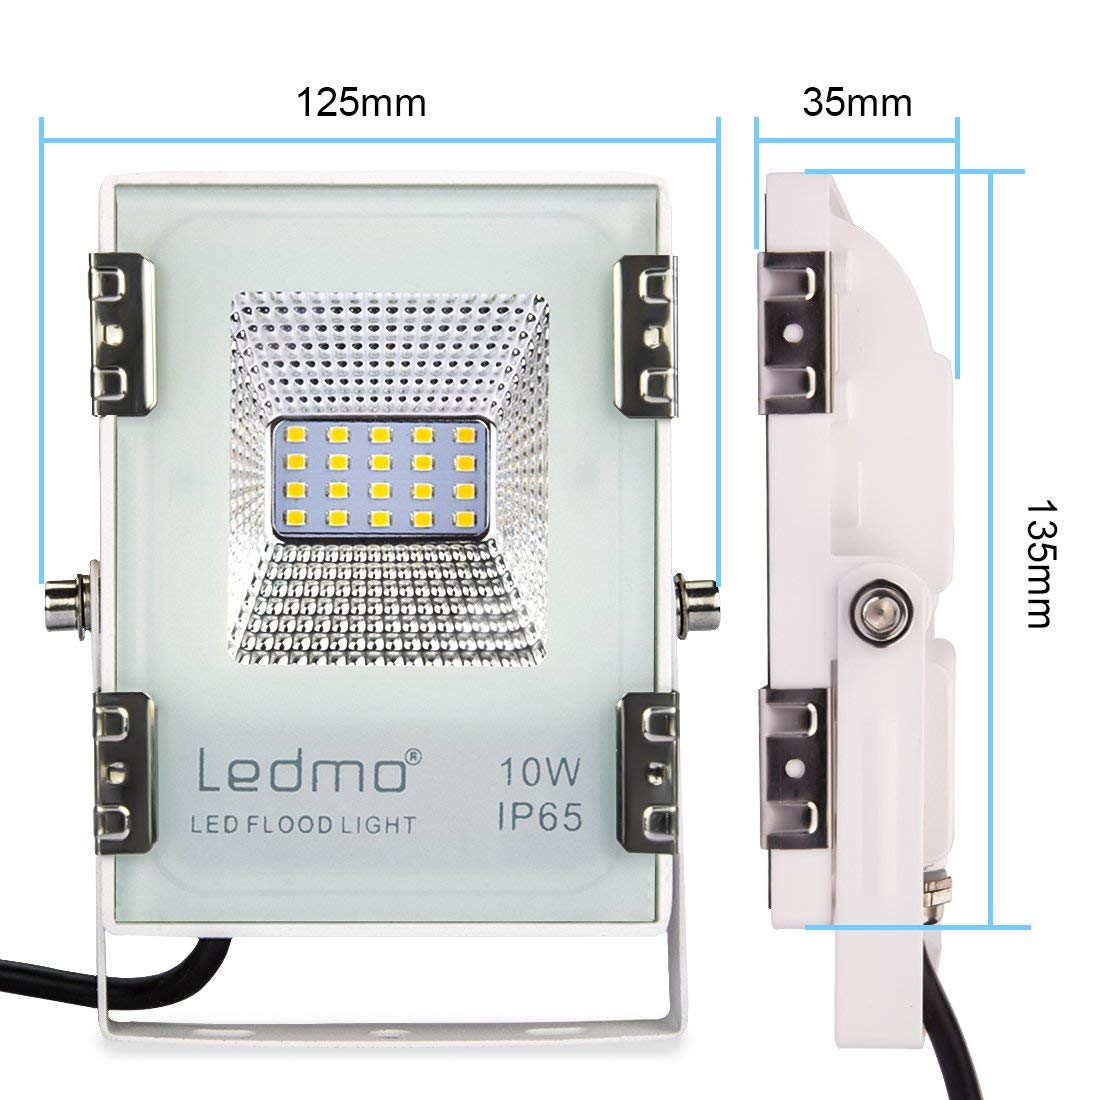 LEDMO 10w led strahler Warmwei/ß Fluter Floodlight Licht Scheinwerfer Au/ßenstrahler Wandstrahler IP65 Wasserdicht AC200-240V